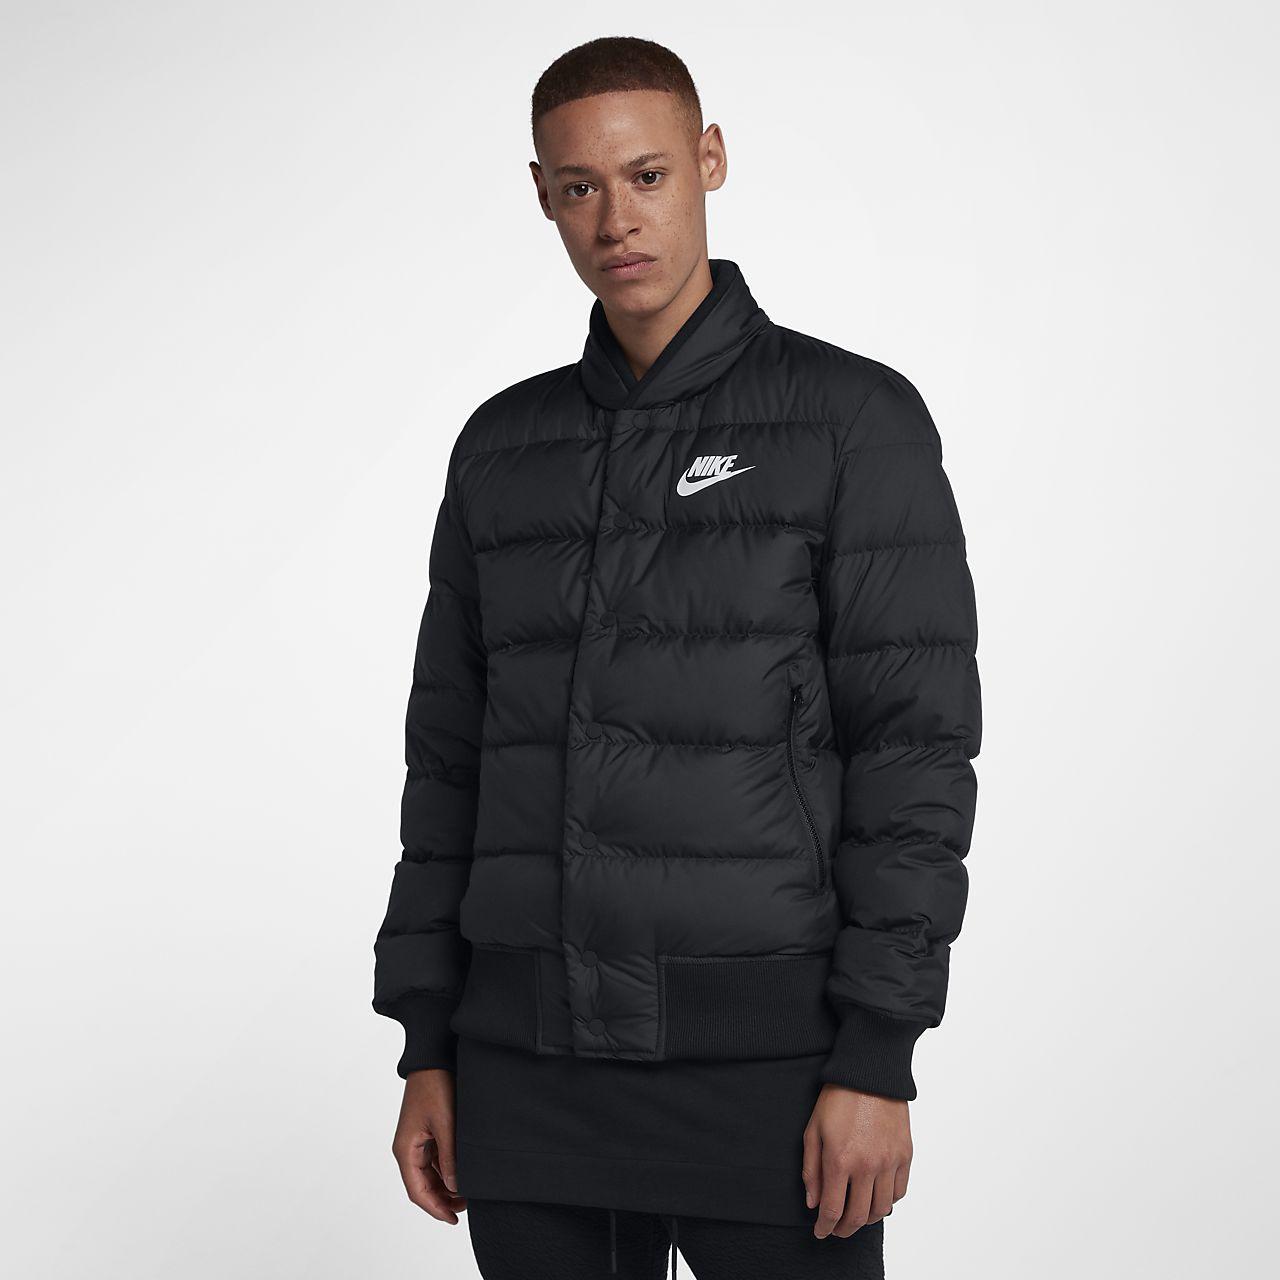 a89477b6e242 Nike Sportswear Down Fill Men s Bomber Jacket. Nike.com CH